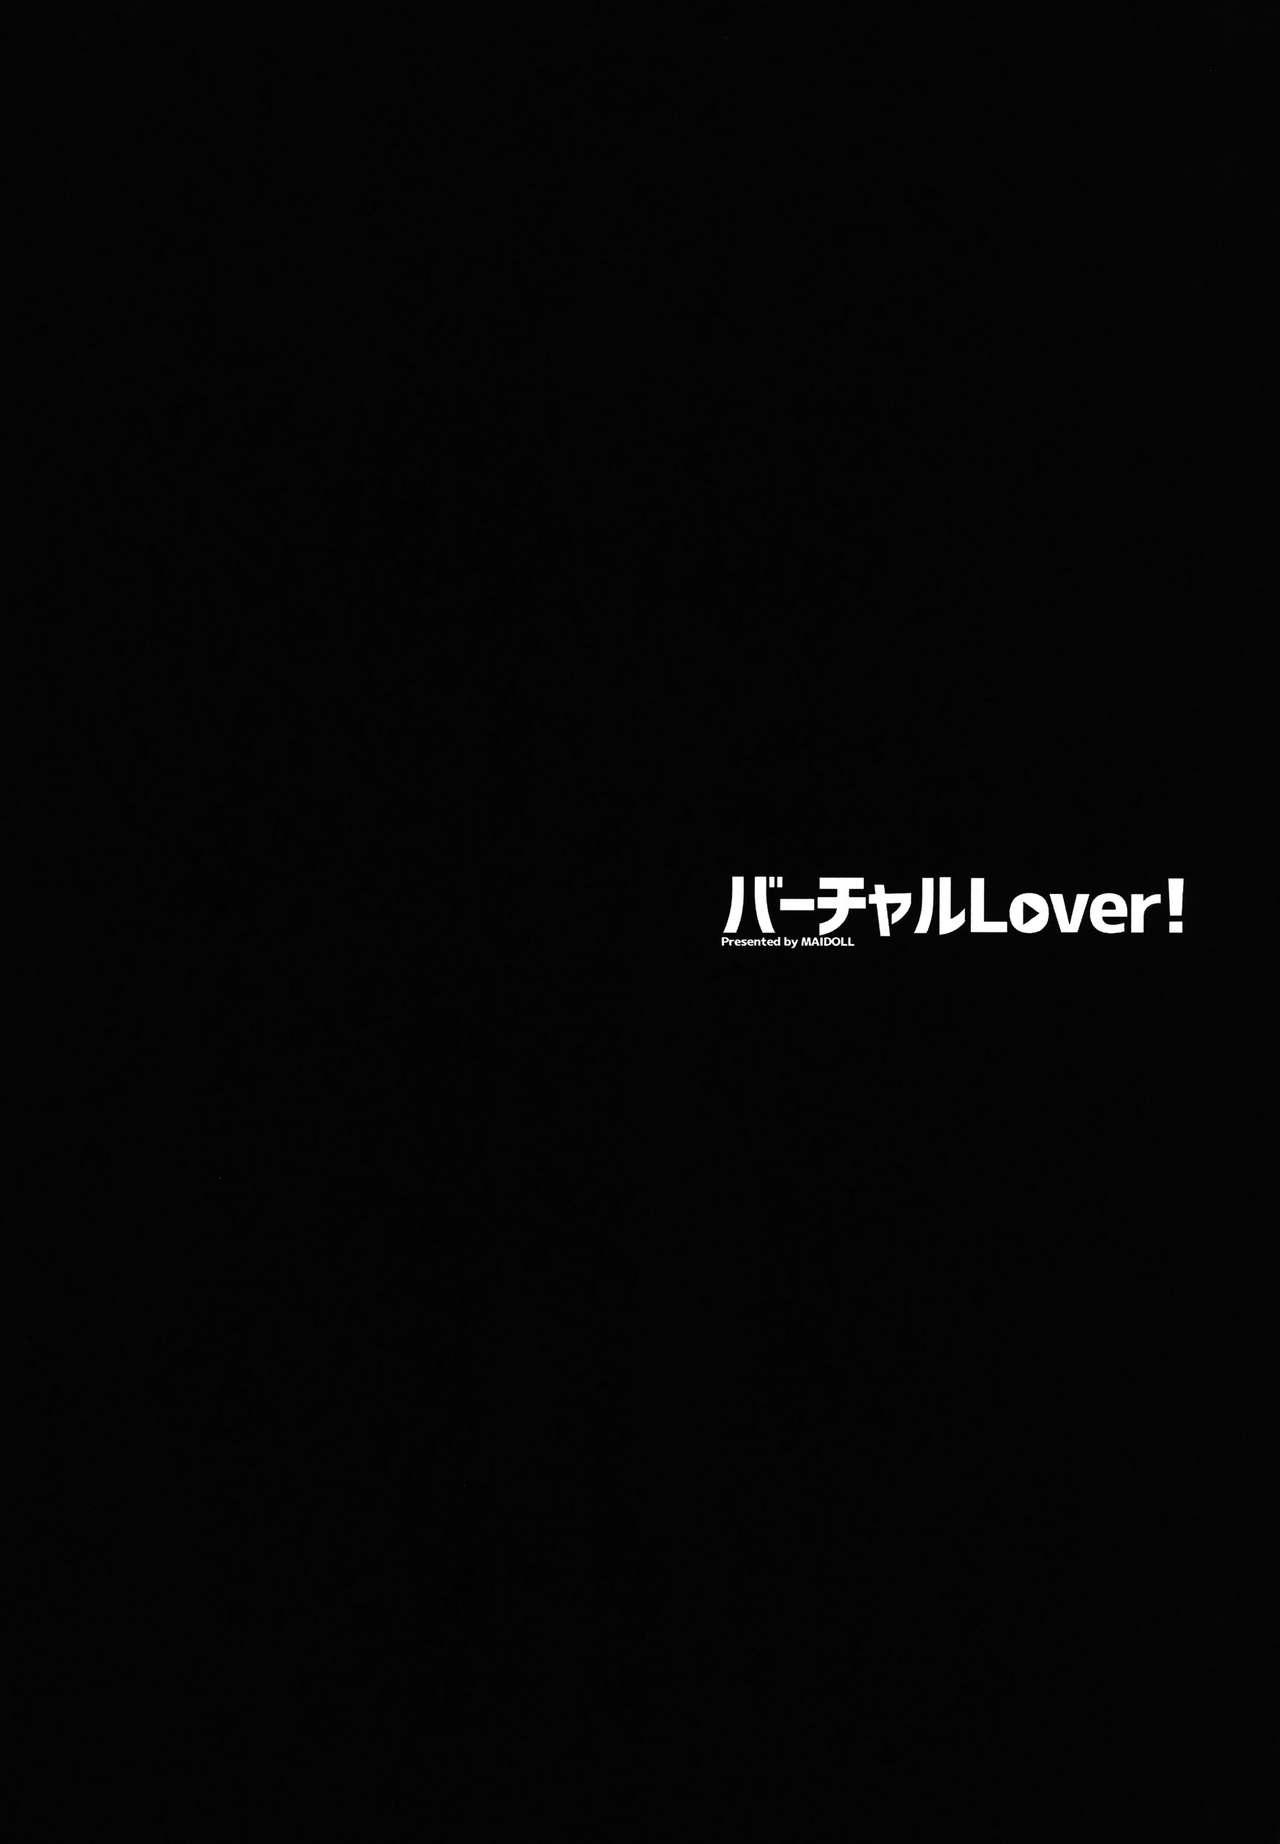 Virtual Lover! + Omake Poster 3